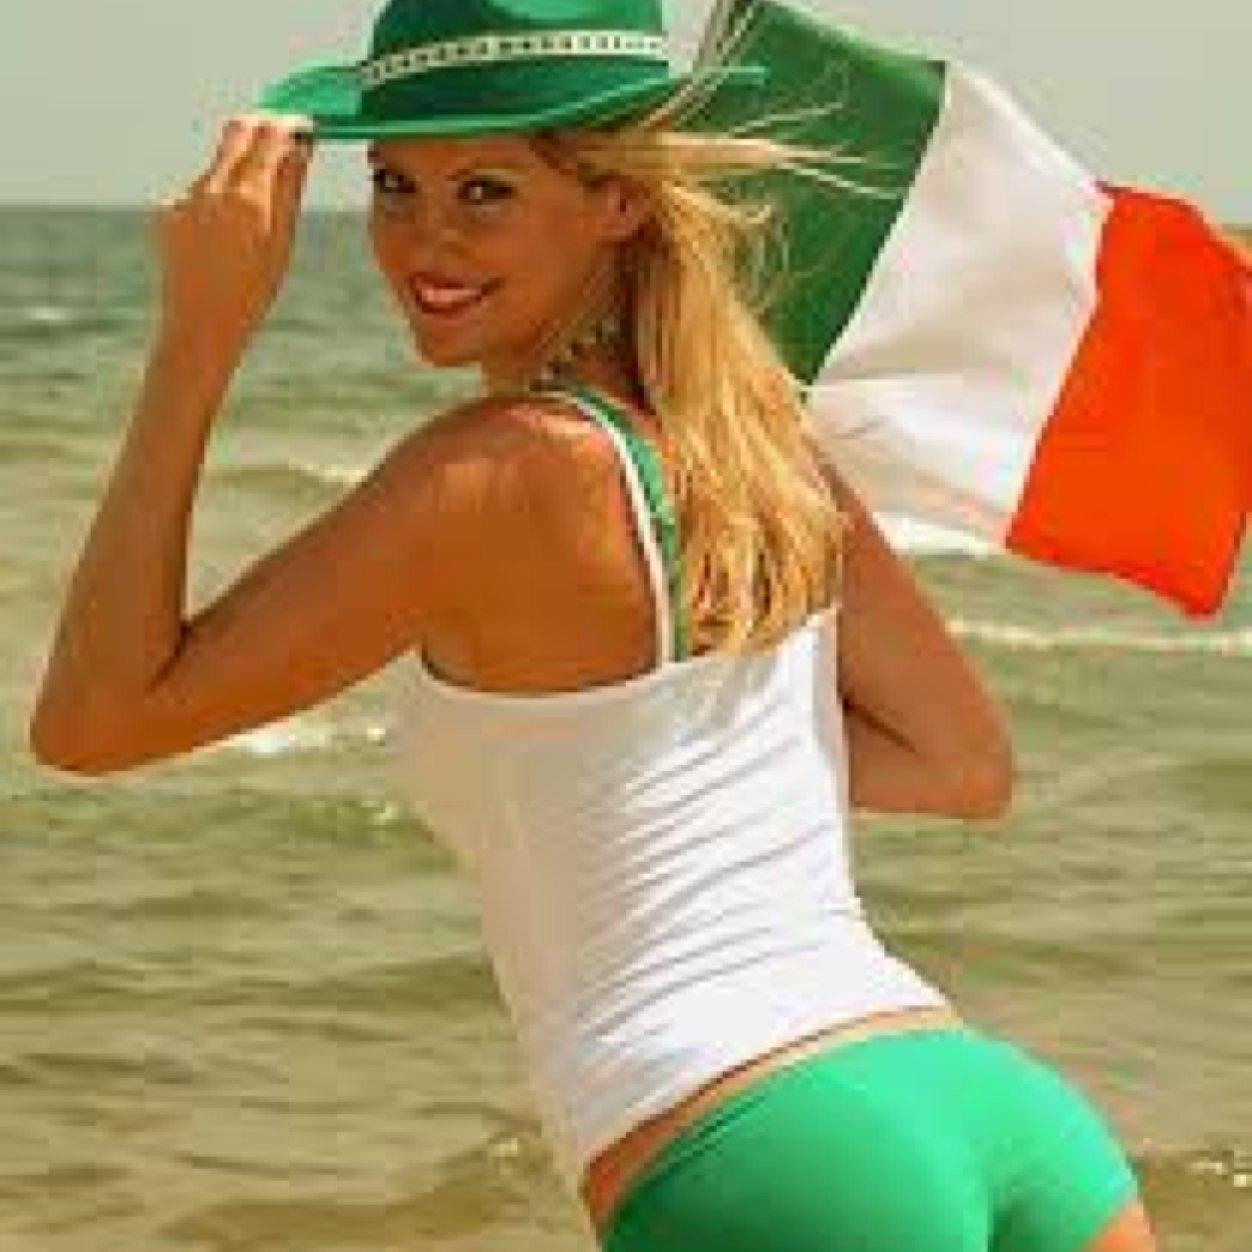 Irish sexiest women